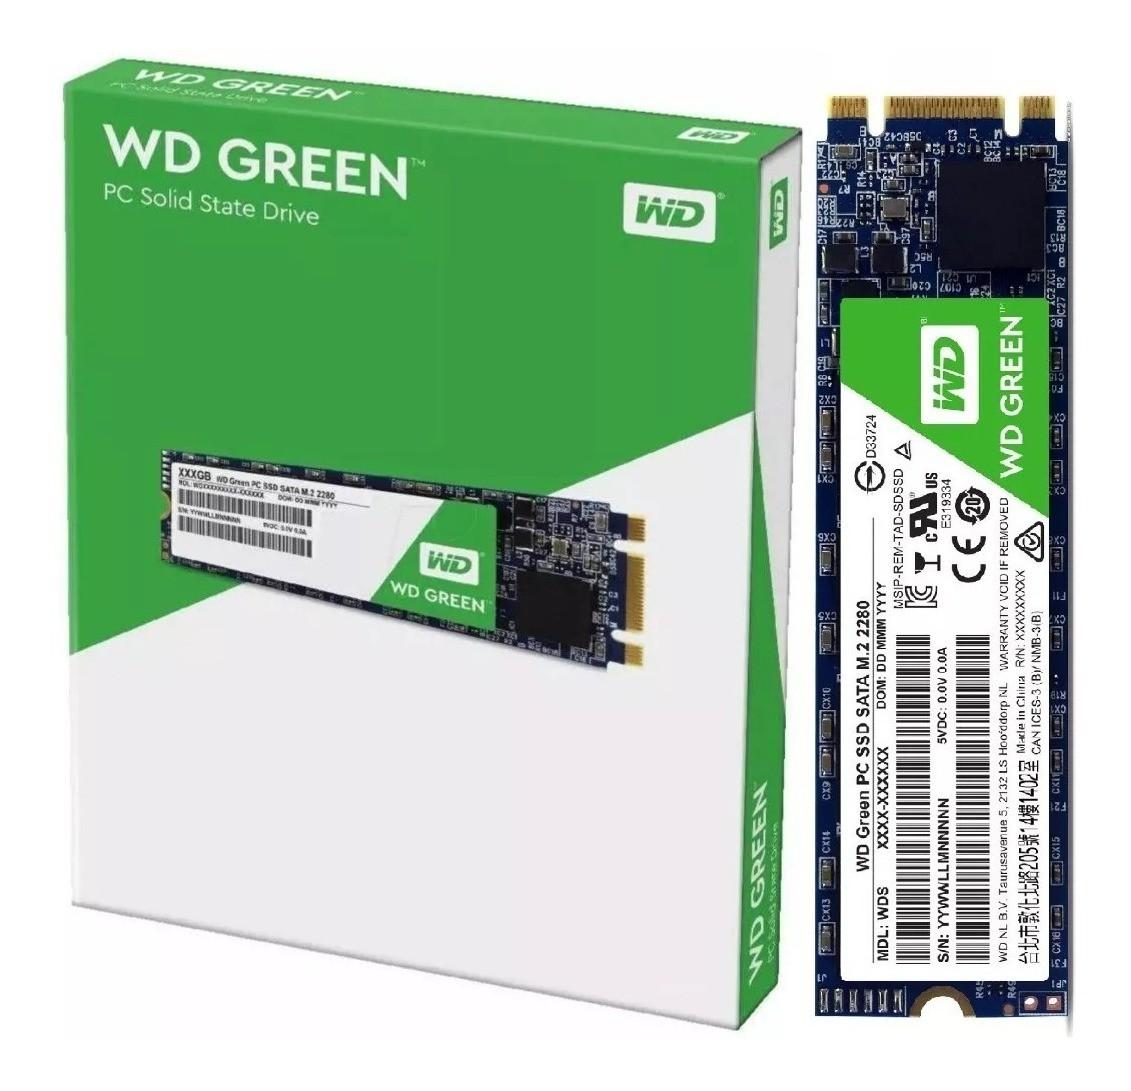 HD SSD M2 240GB SATA3 WESTERN DIGITAL